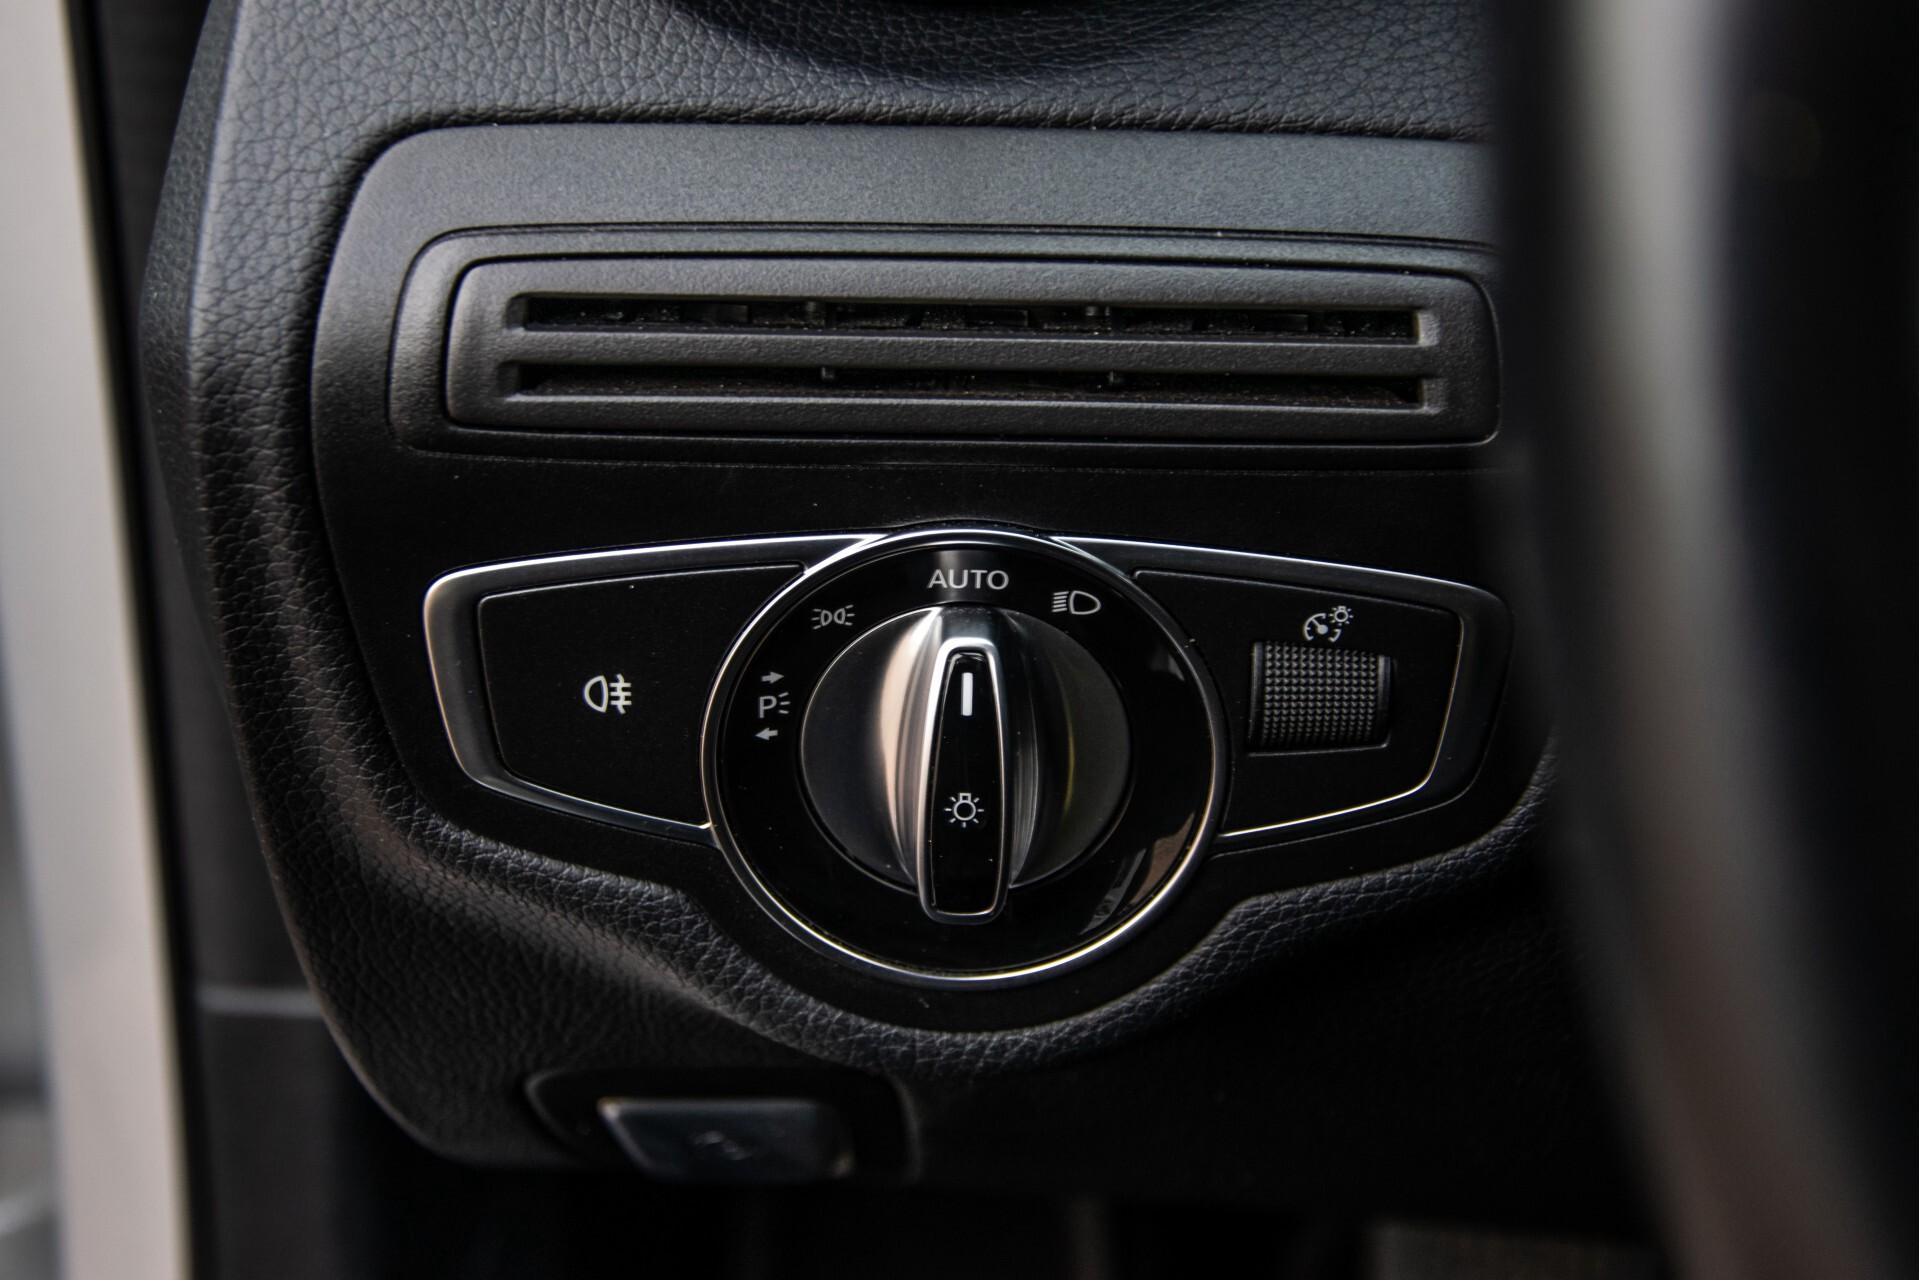 Mercedes-Benz C-Klasse 180 Bluetec Lease Edition Intelligent Light System/Cruise Control/Navi Foto 25